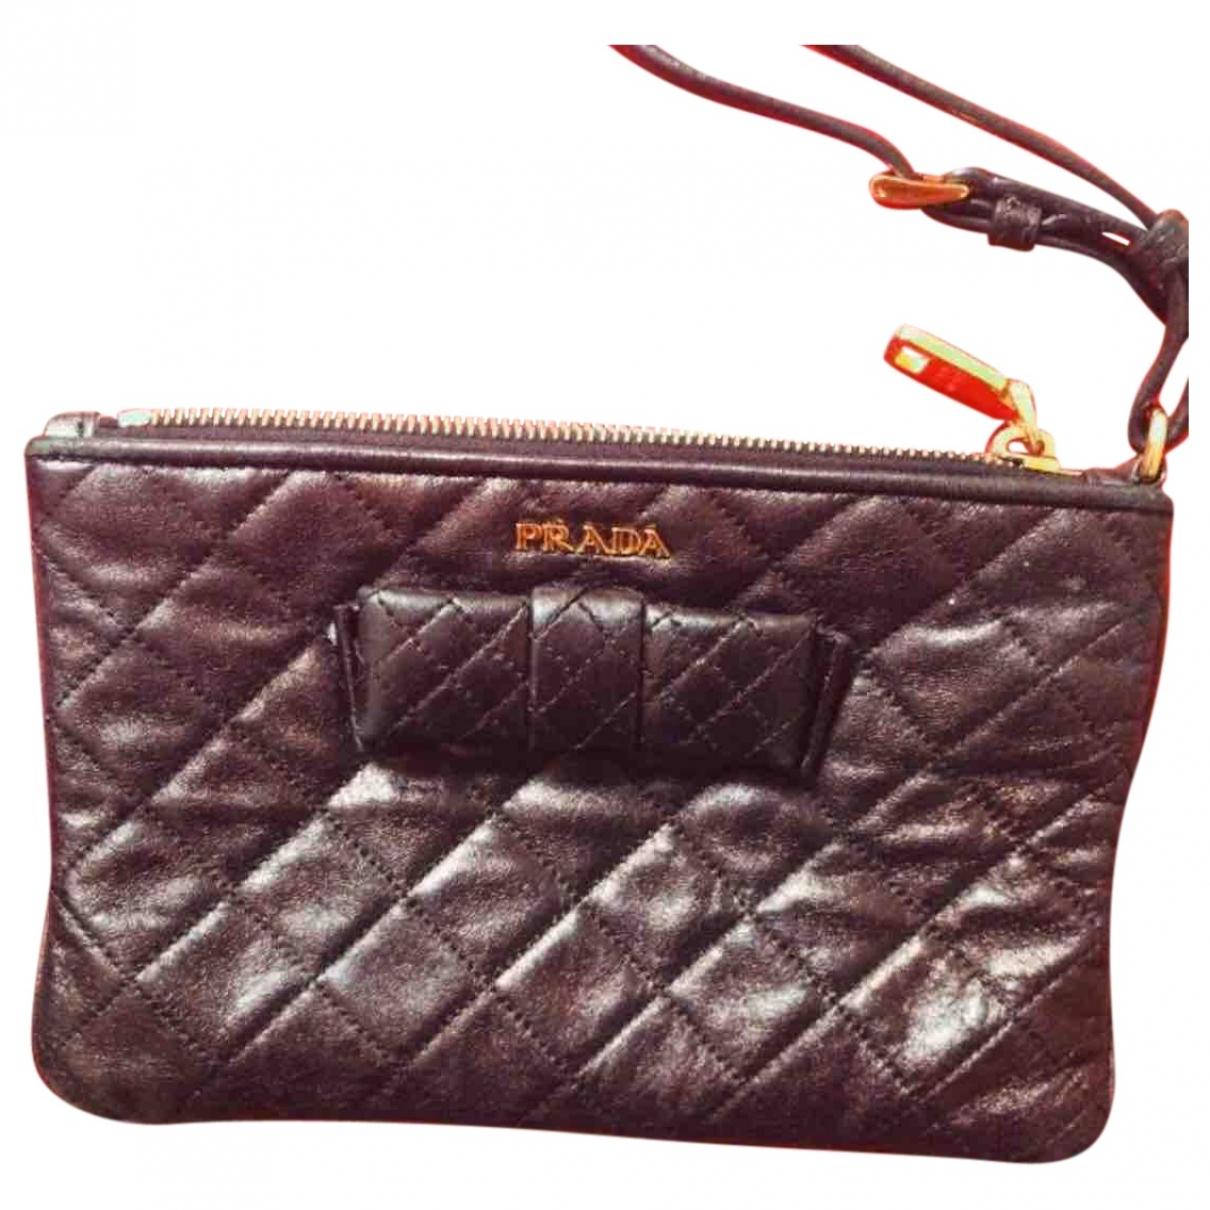 Prada \N Black Clutch bag for Women \N